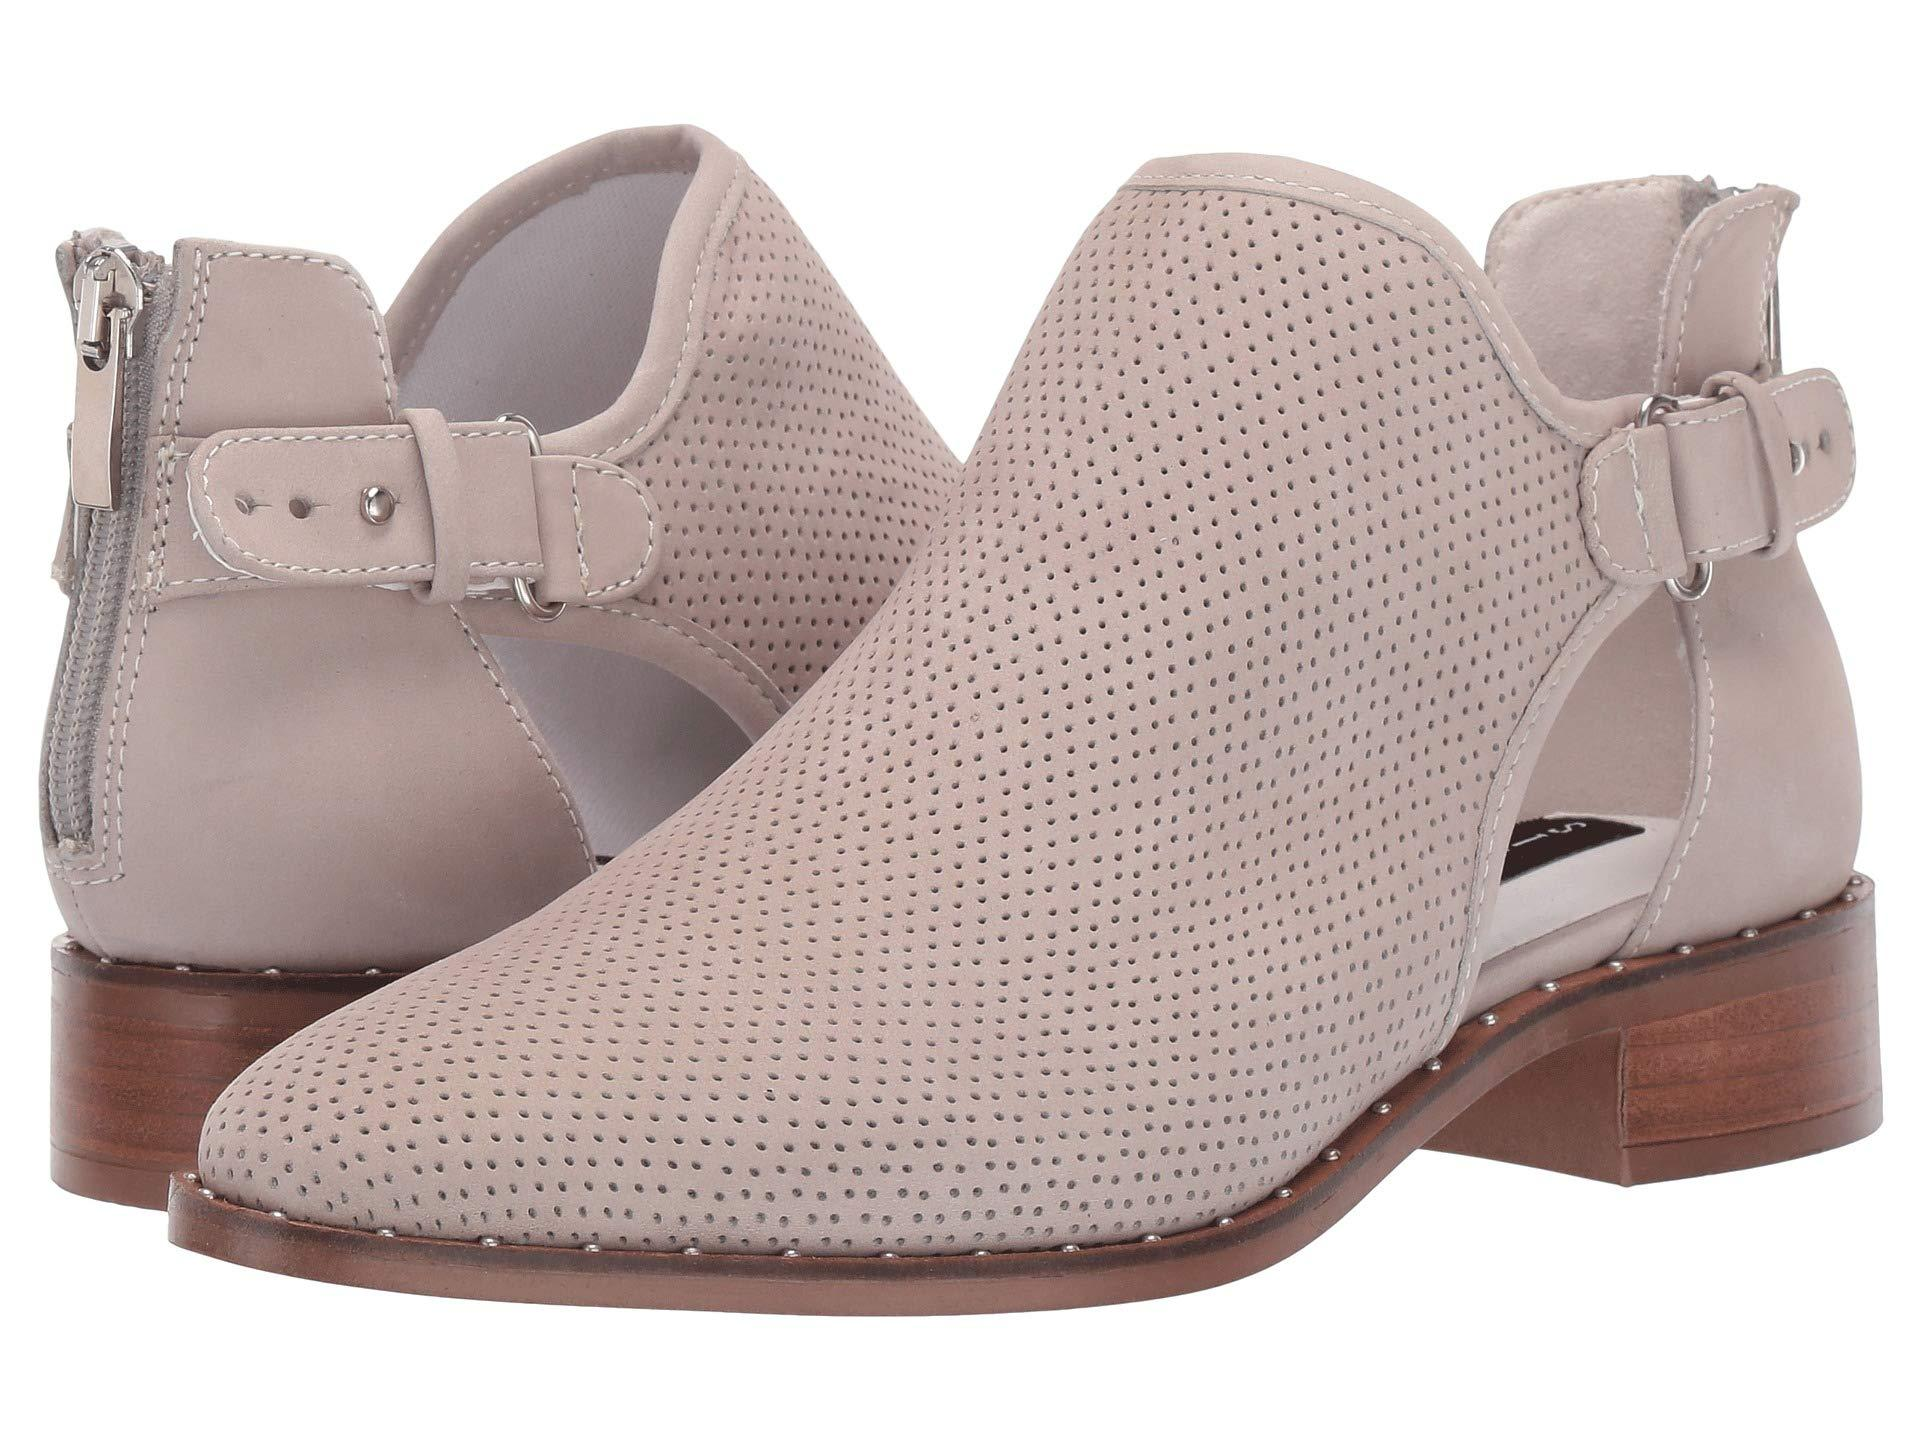 80121775c98 Lyst - Steven by Steve Madden Cusp (black Nubuck) Women s Shoes